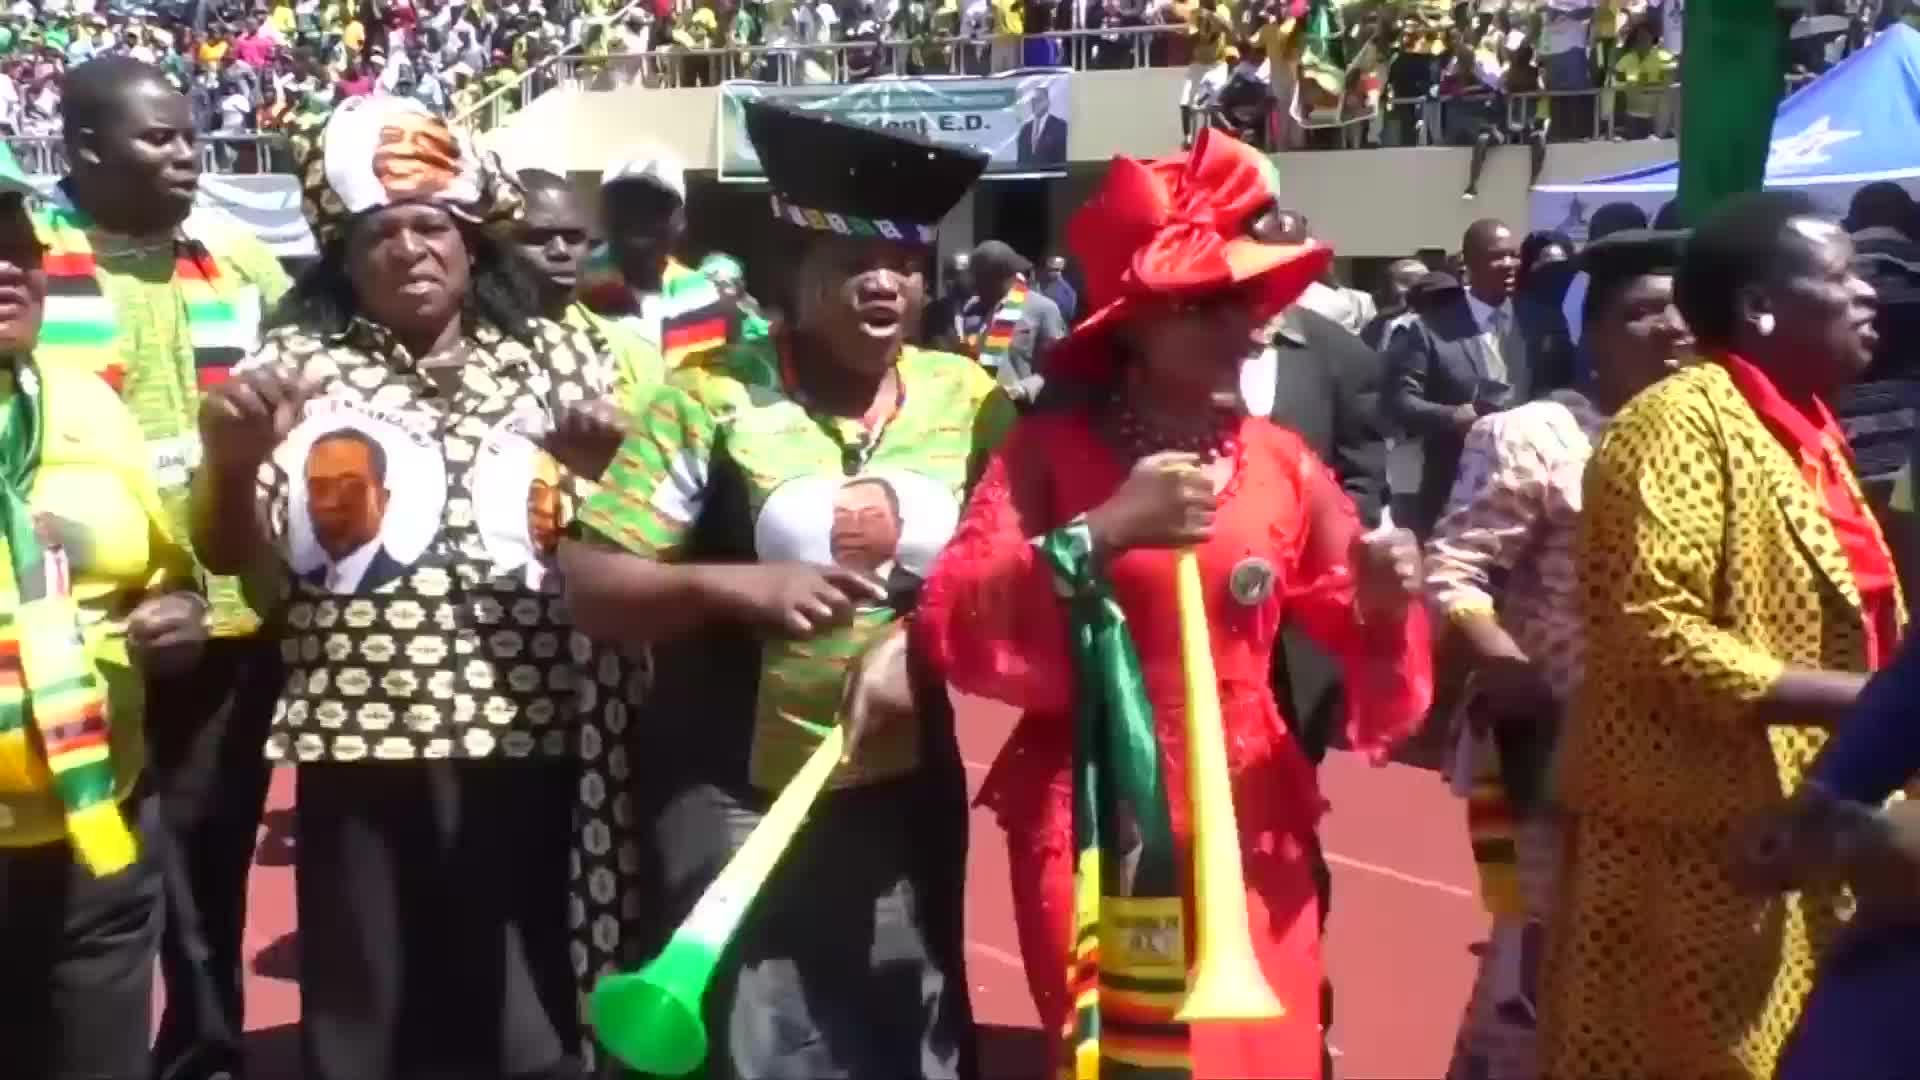 Video: Zimbabwe's Mnangagwa was sworn in